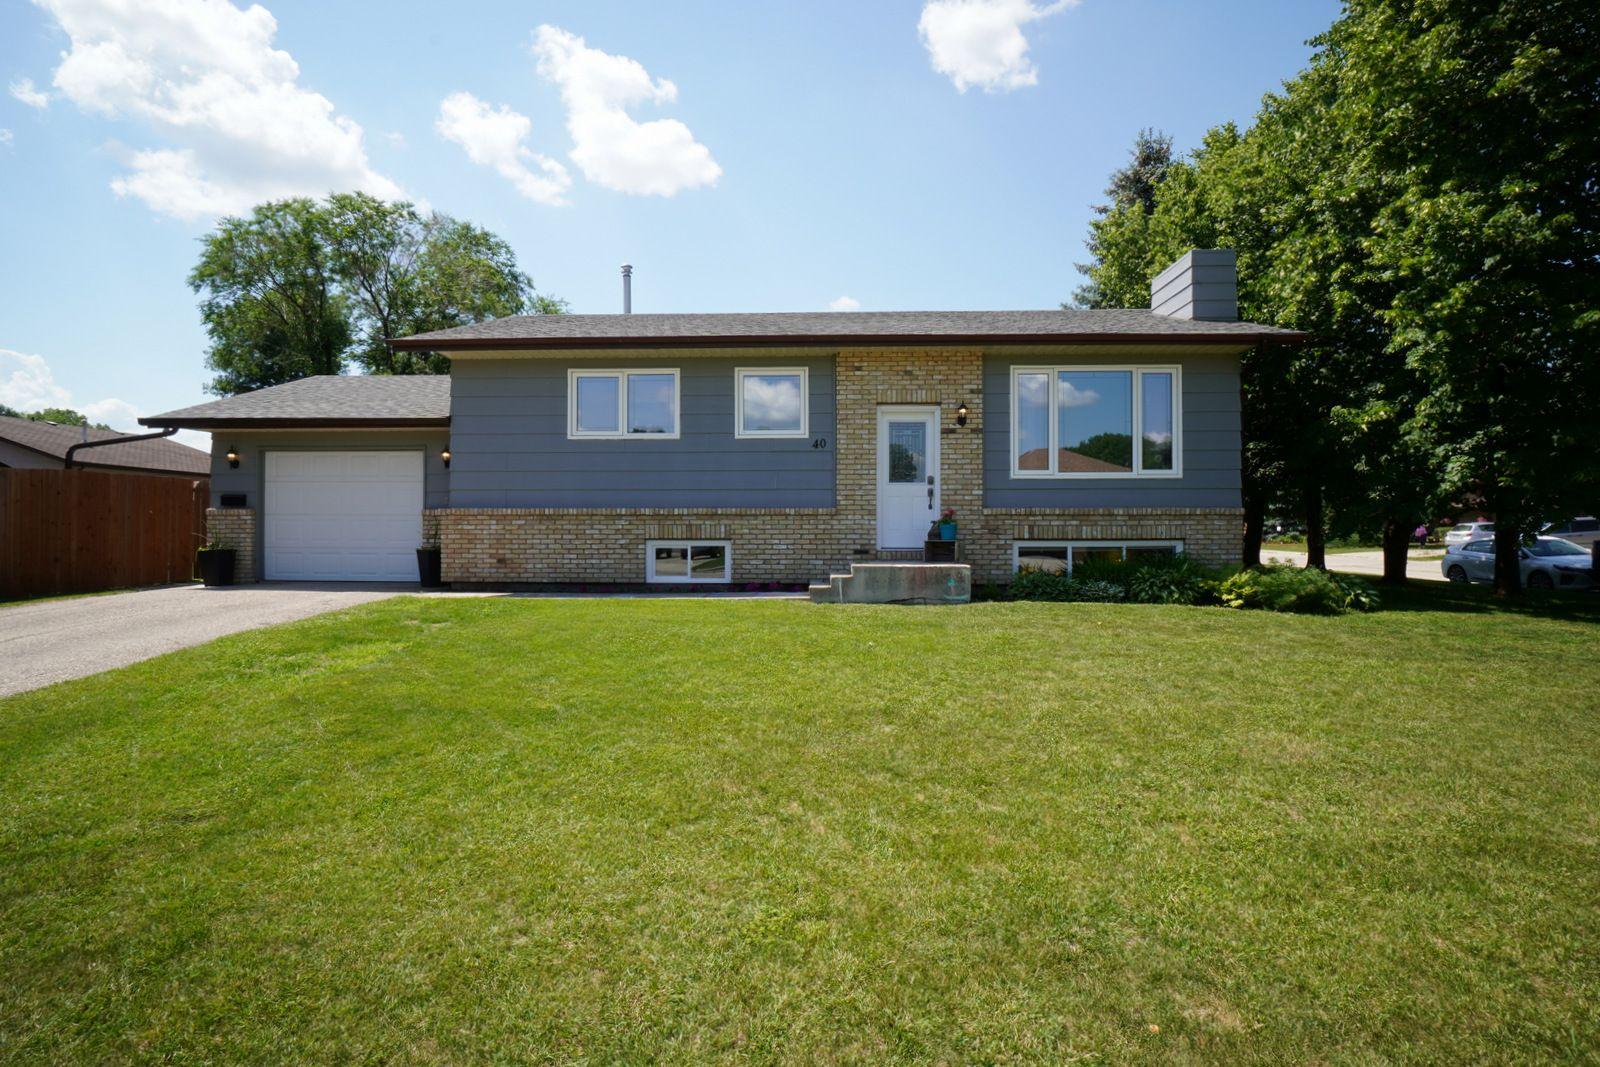 Main Photo: 40 Brown Bay in Portage la Prairie: House for sale : MLS®# 202116386